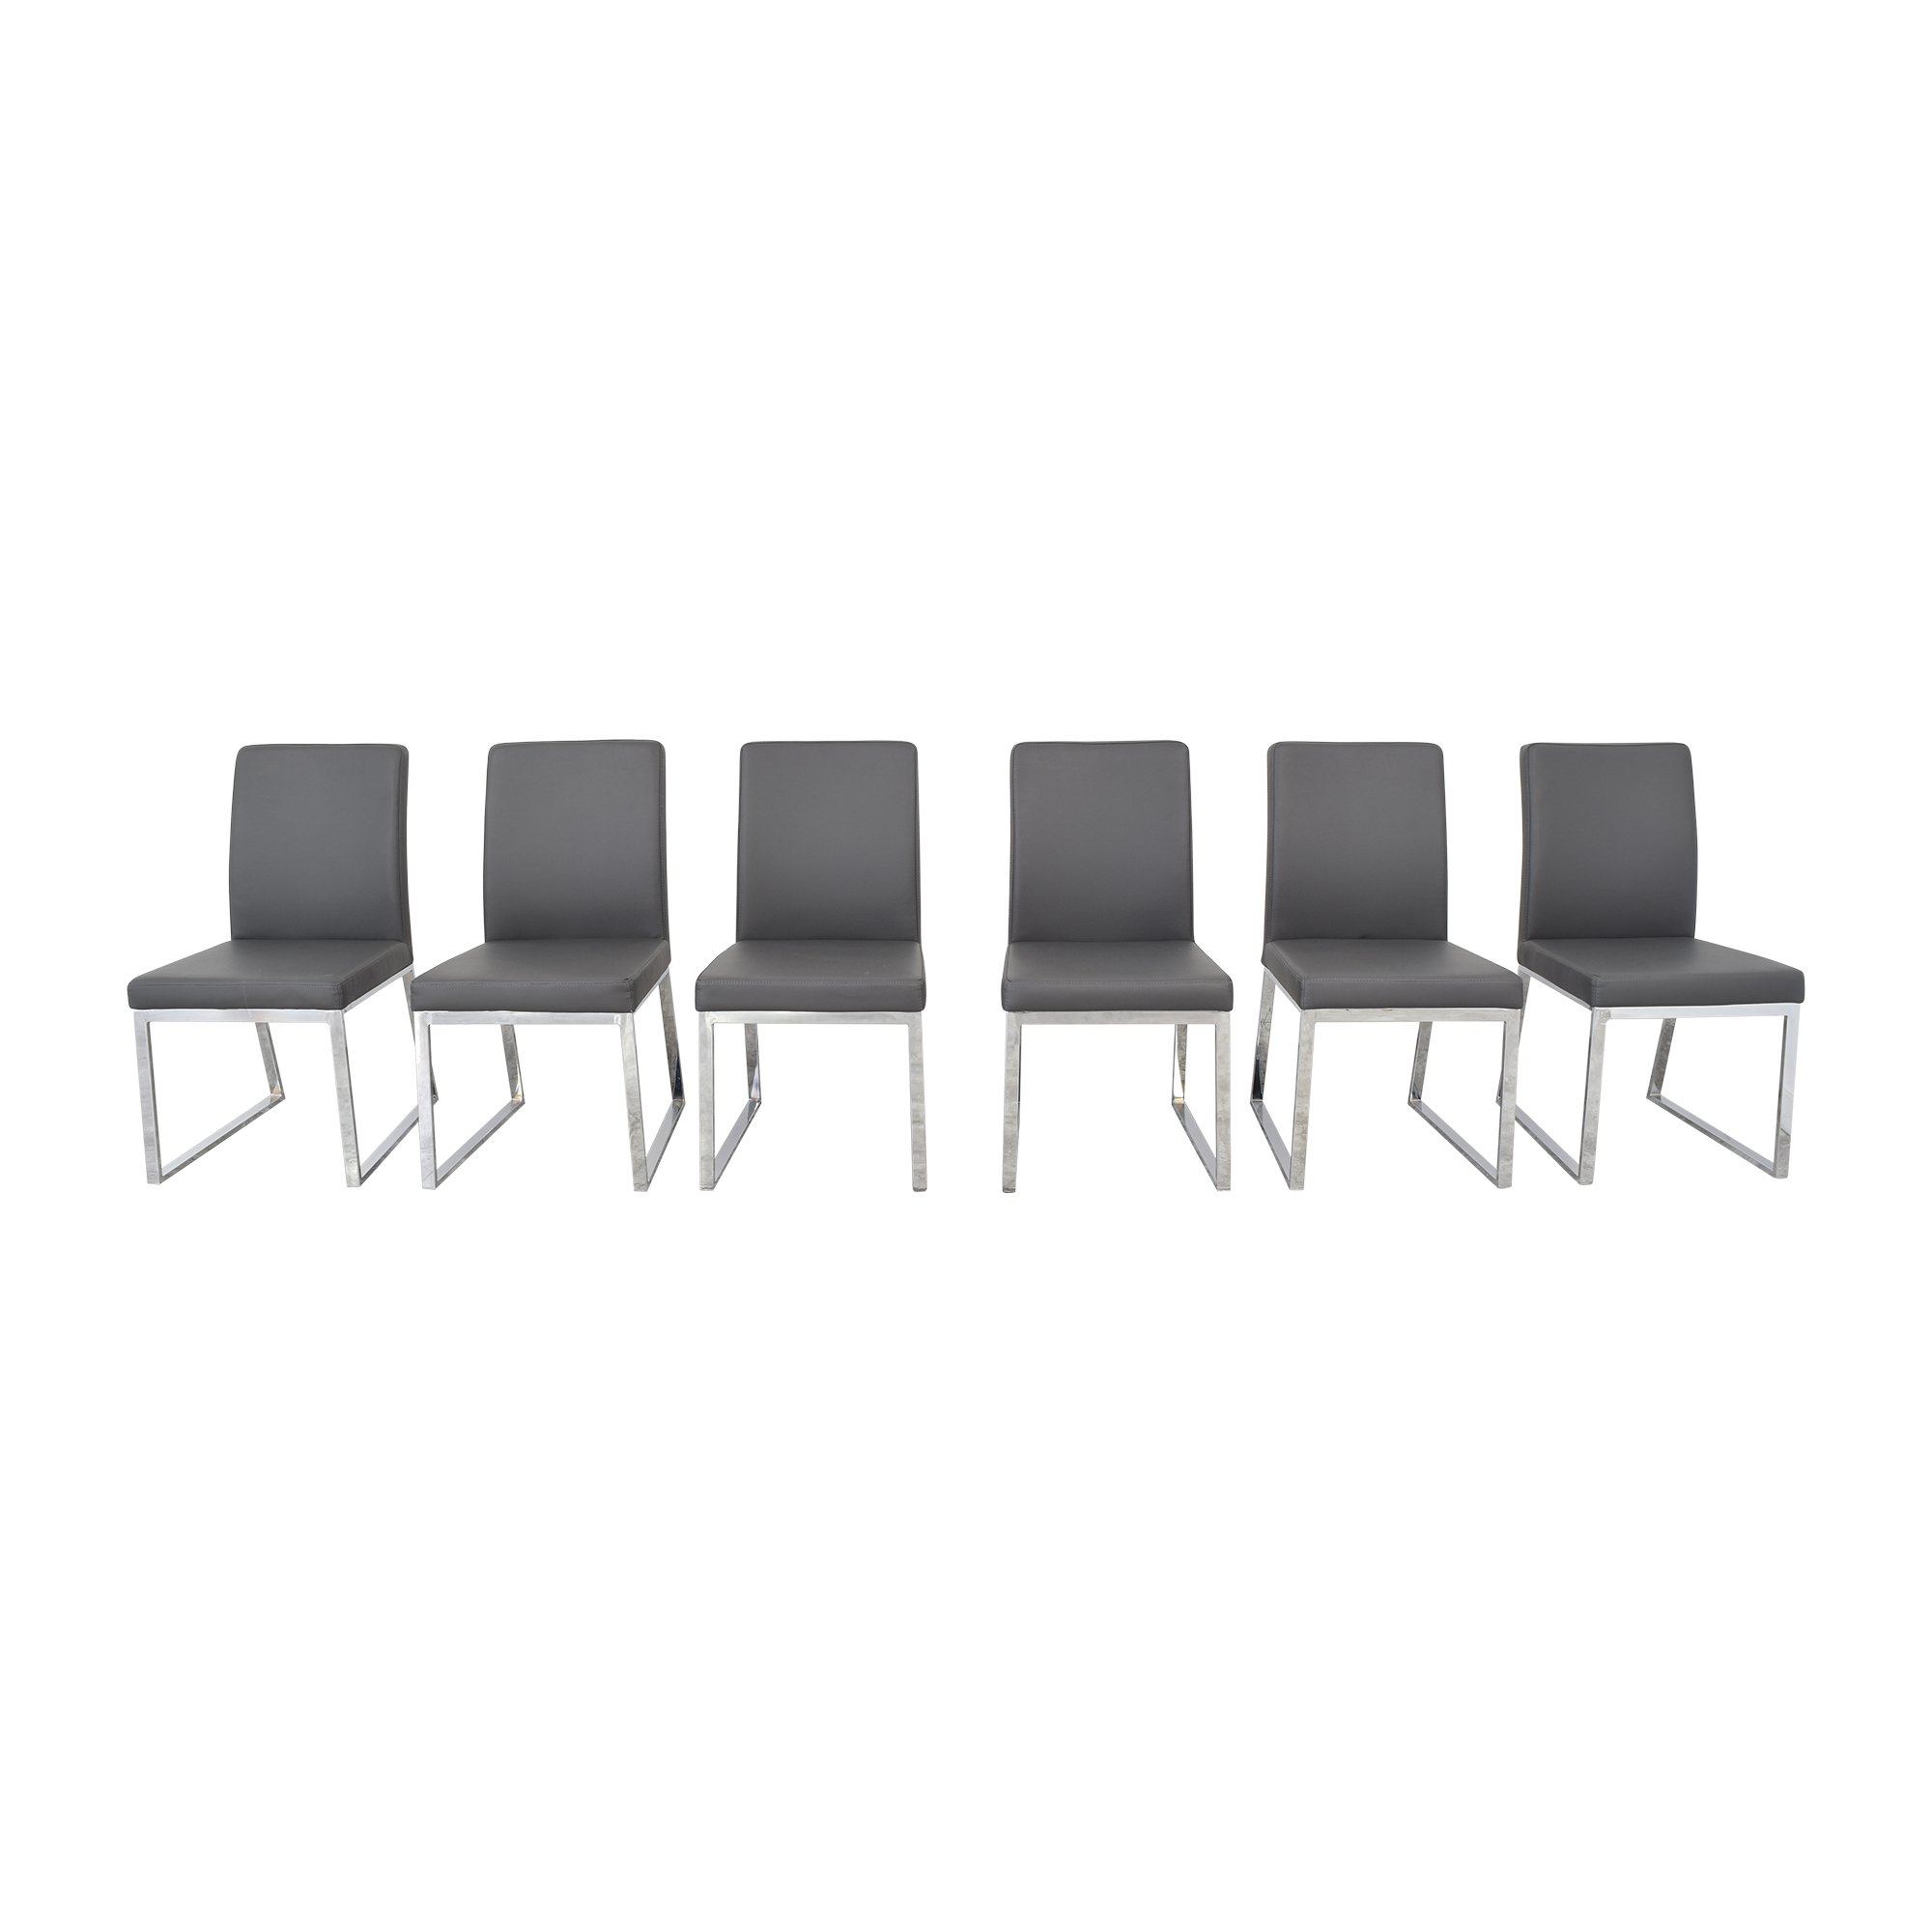 Modani Modani Niero Dining Chairs price